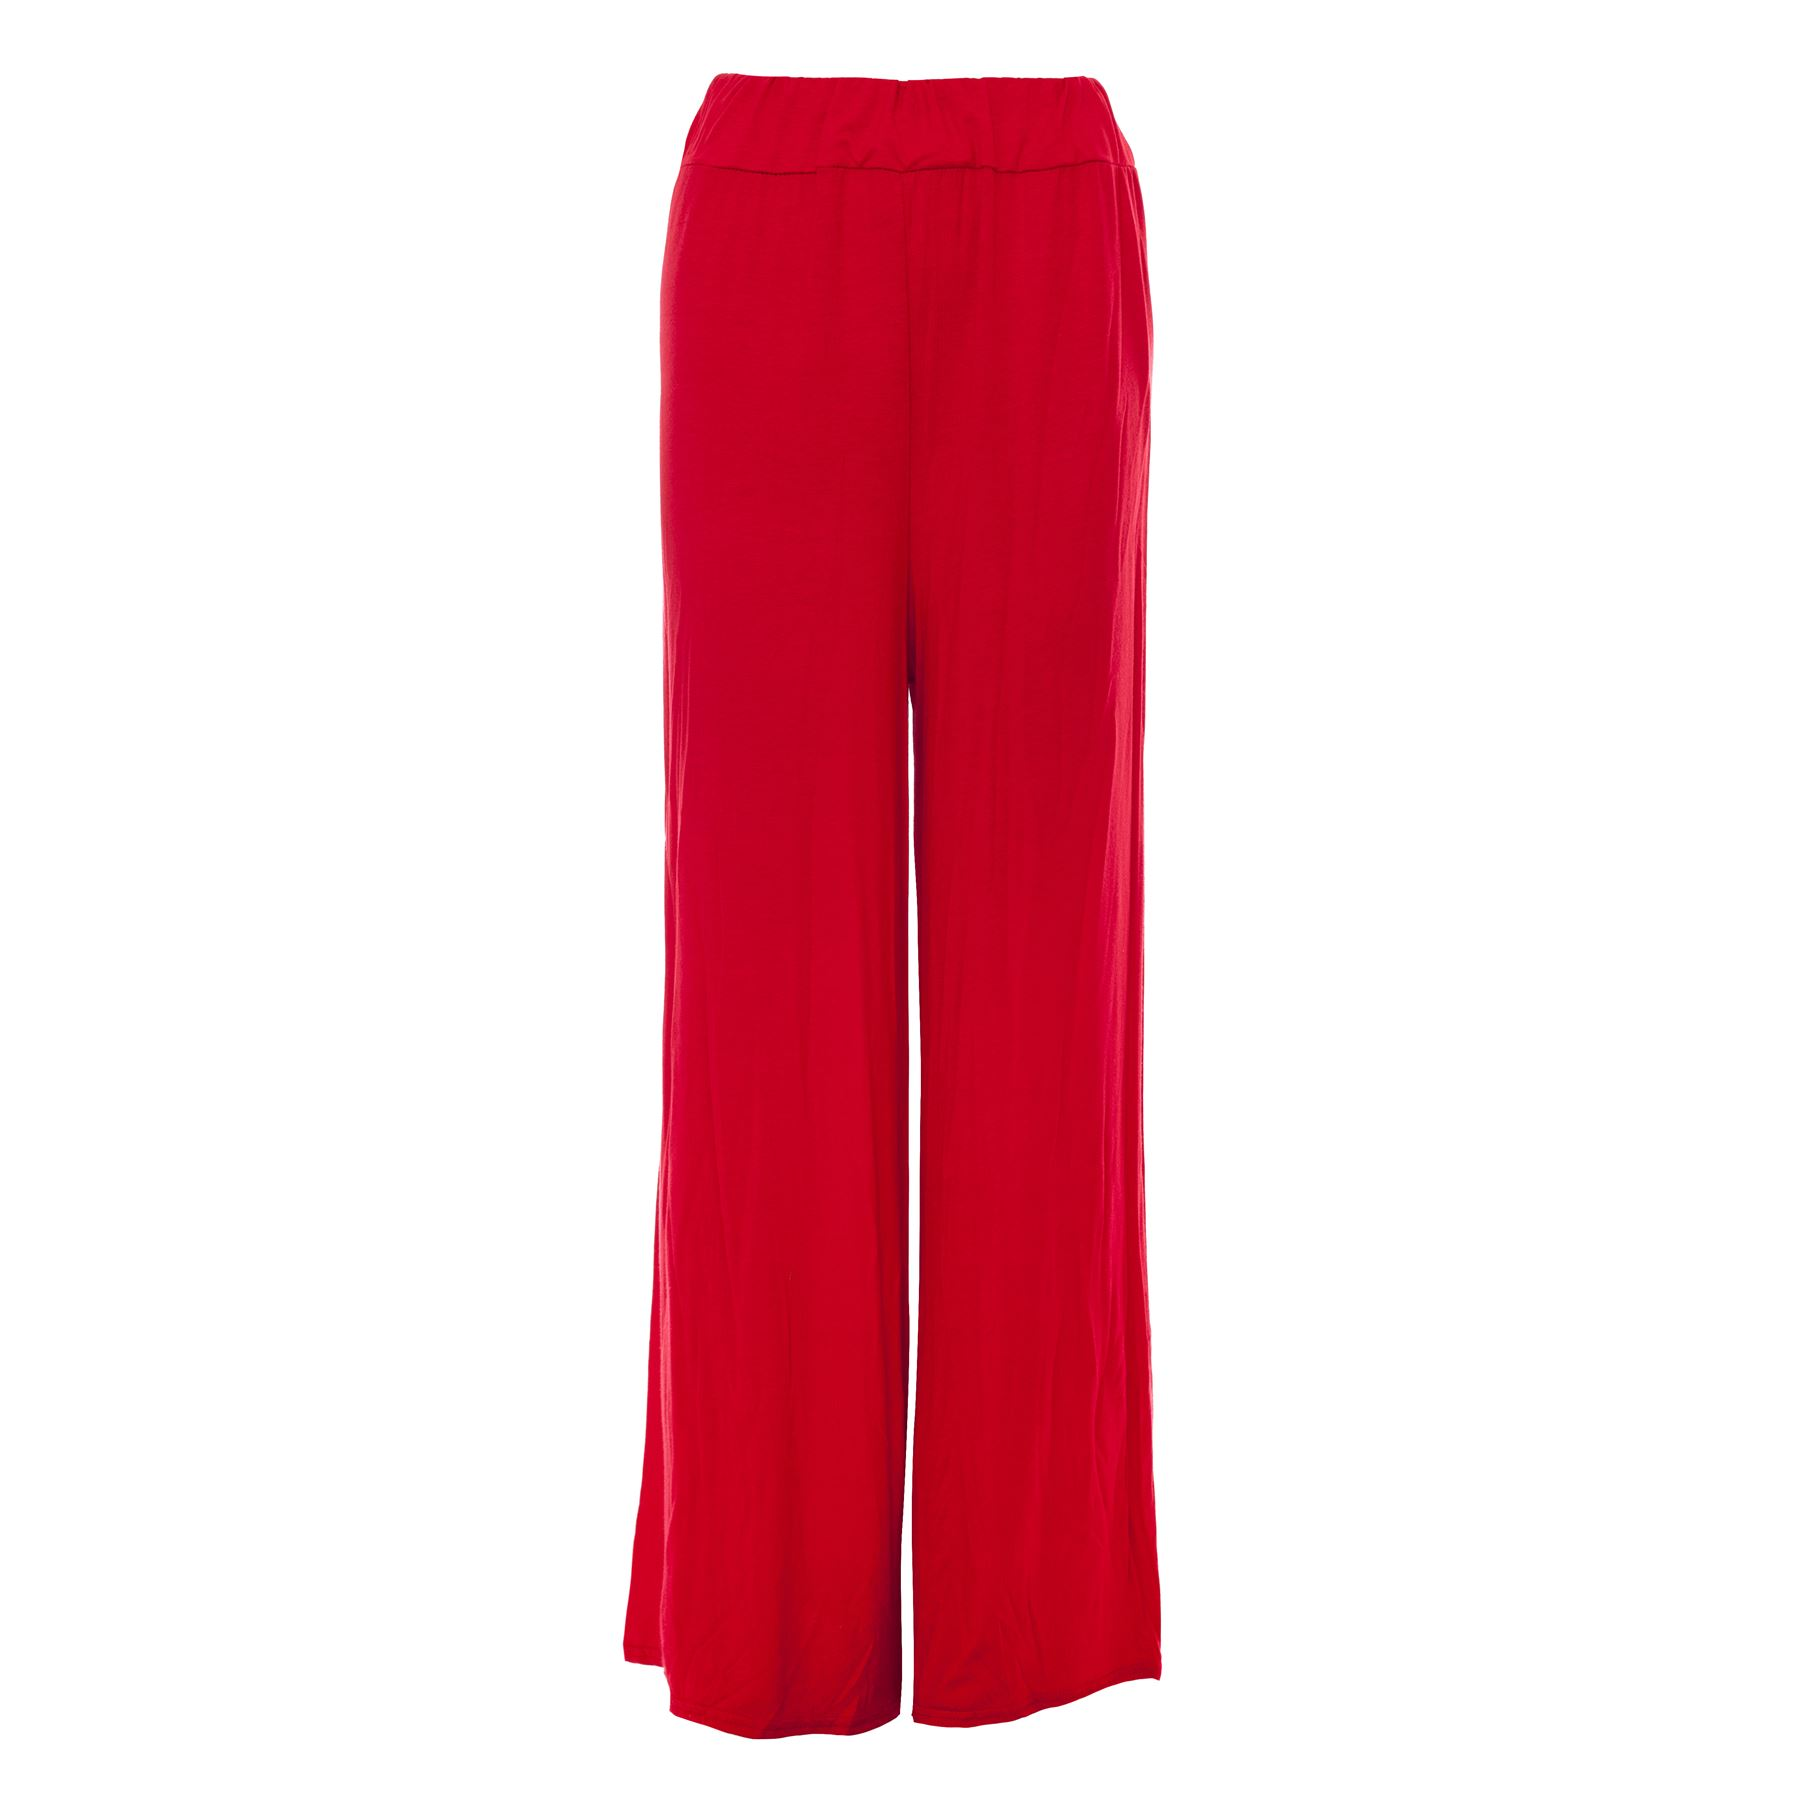 8bcc17033af2b Womens Palazzo Wide Leg Trousers Ladies Plain Flared Legging Pant Plus Size  8-26